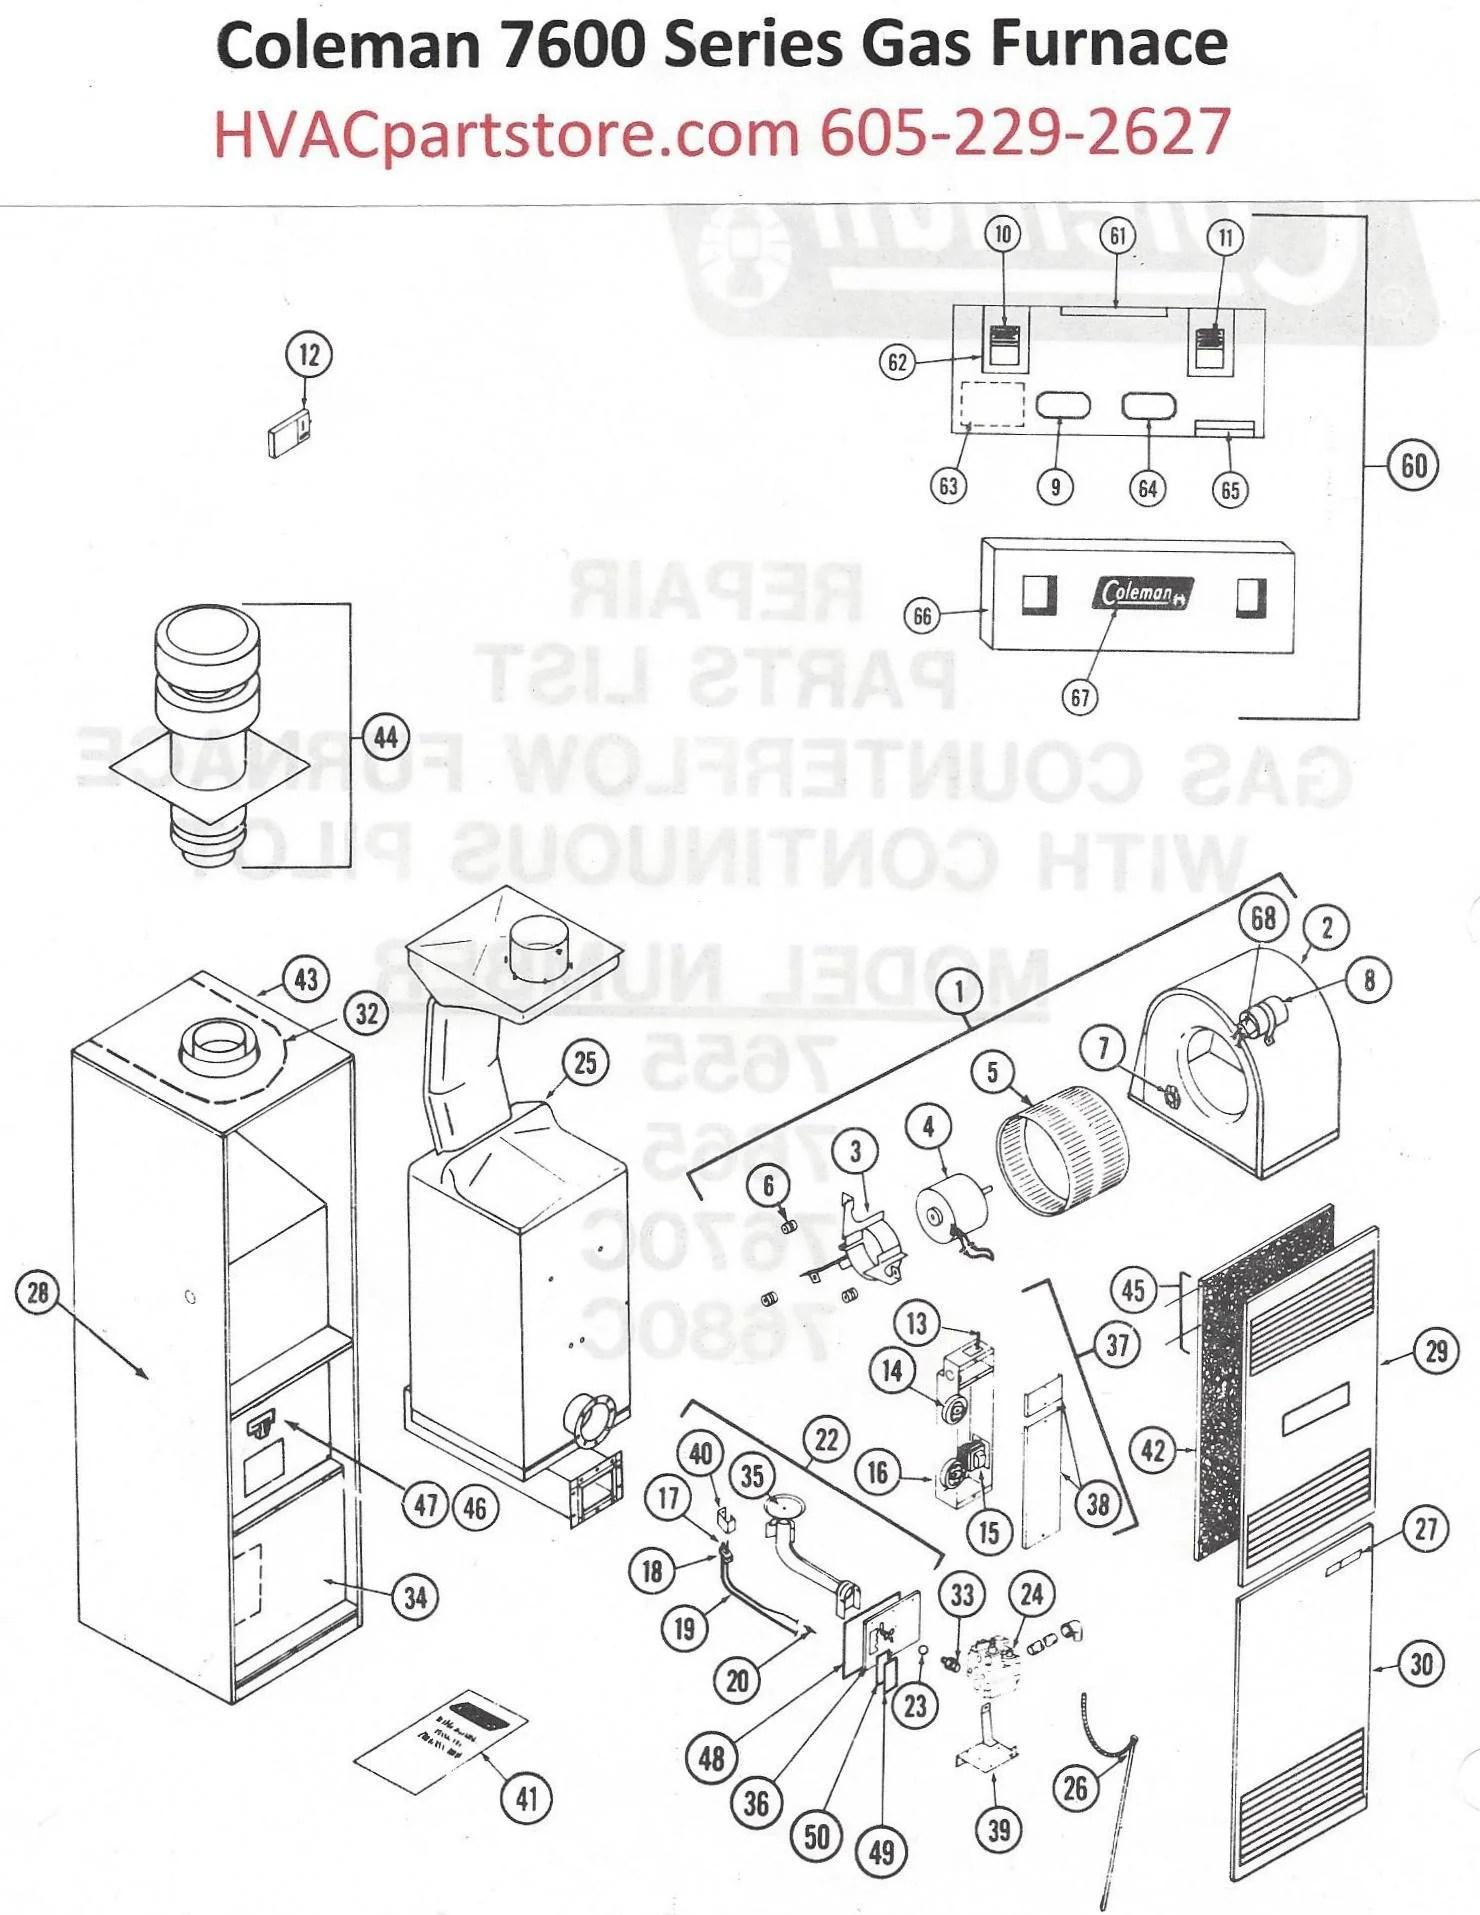 Jcb 165 Wiring Diagram Trusted Schematics 214 Loader Backhoe 520 Diagrams Load All Alternator